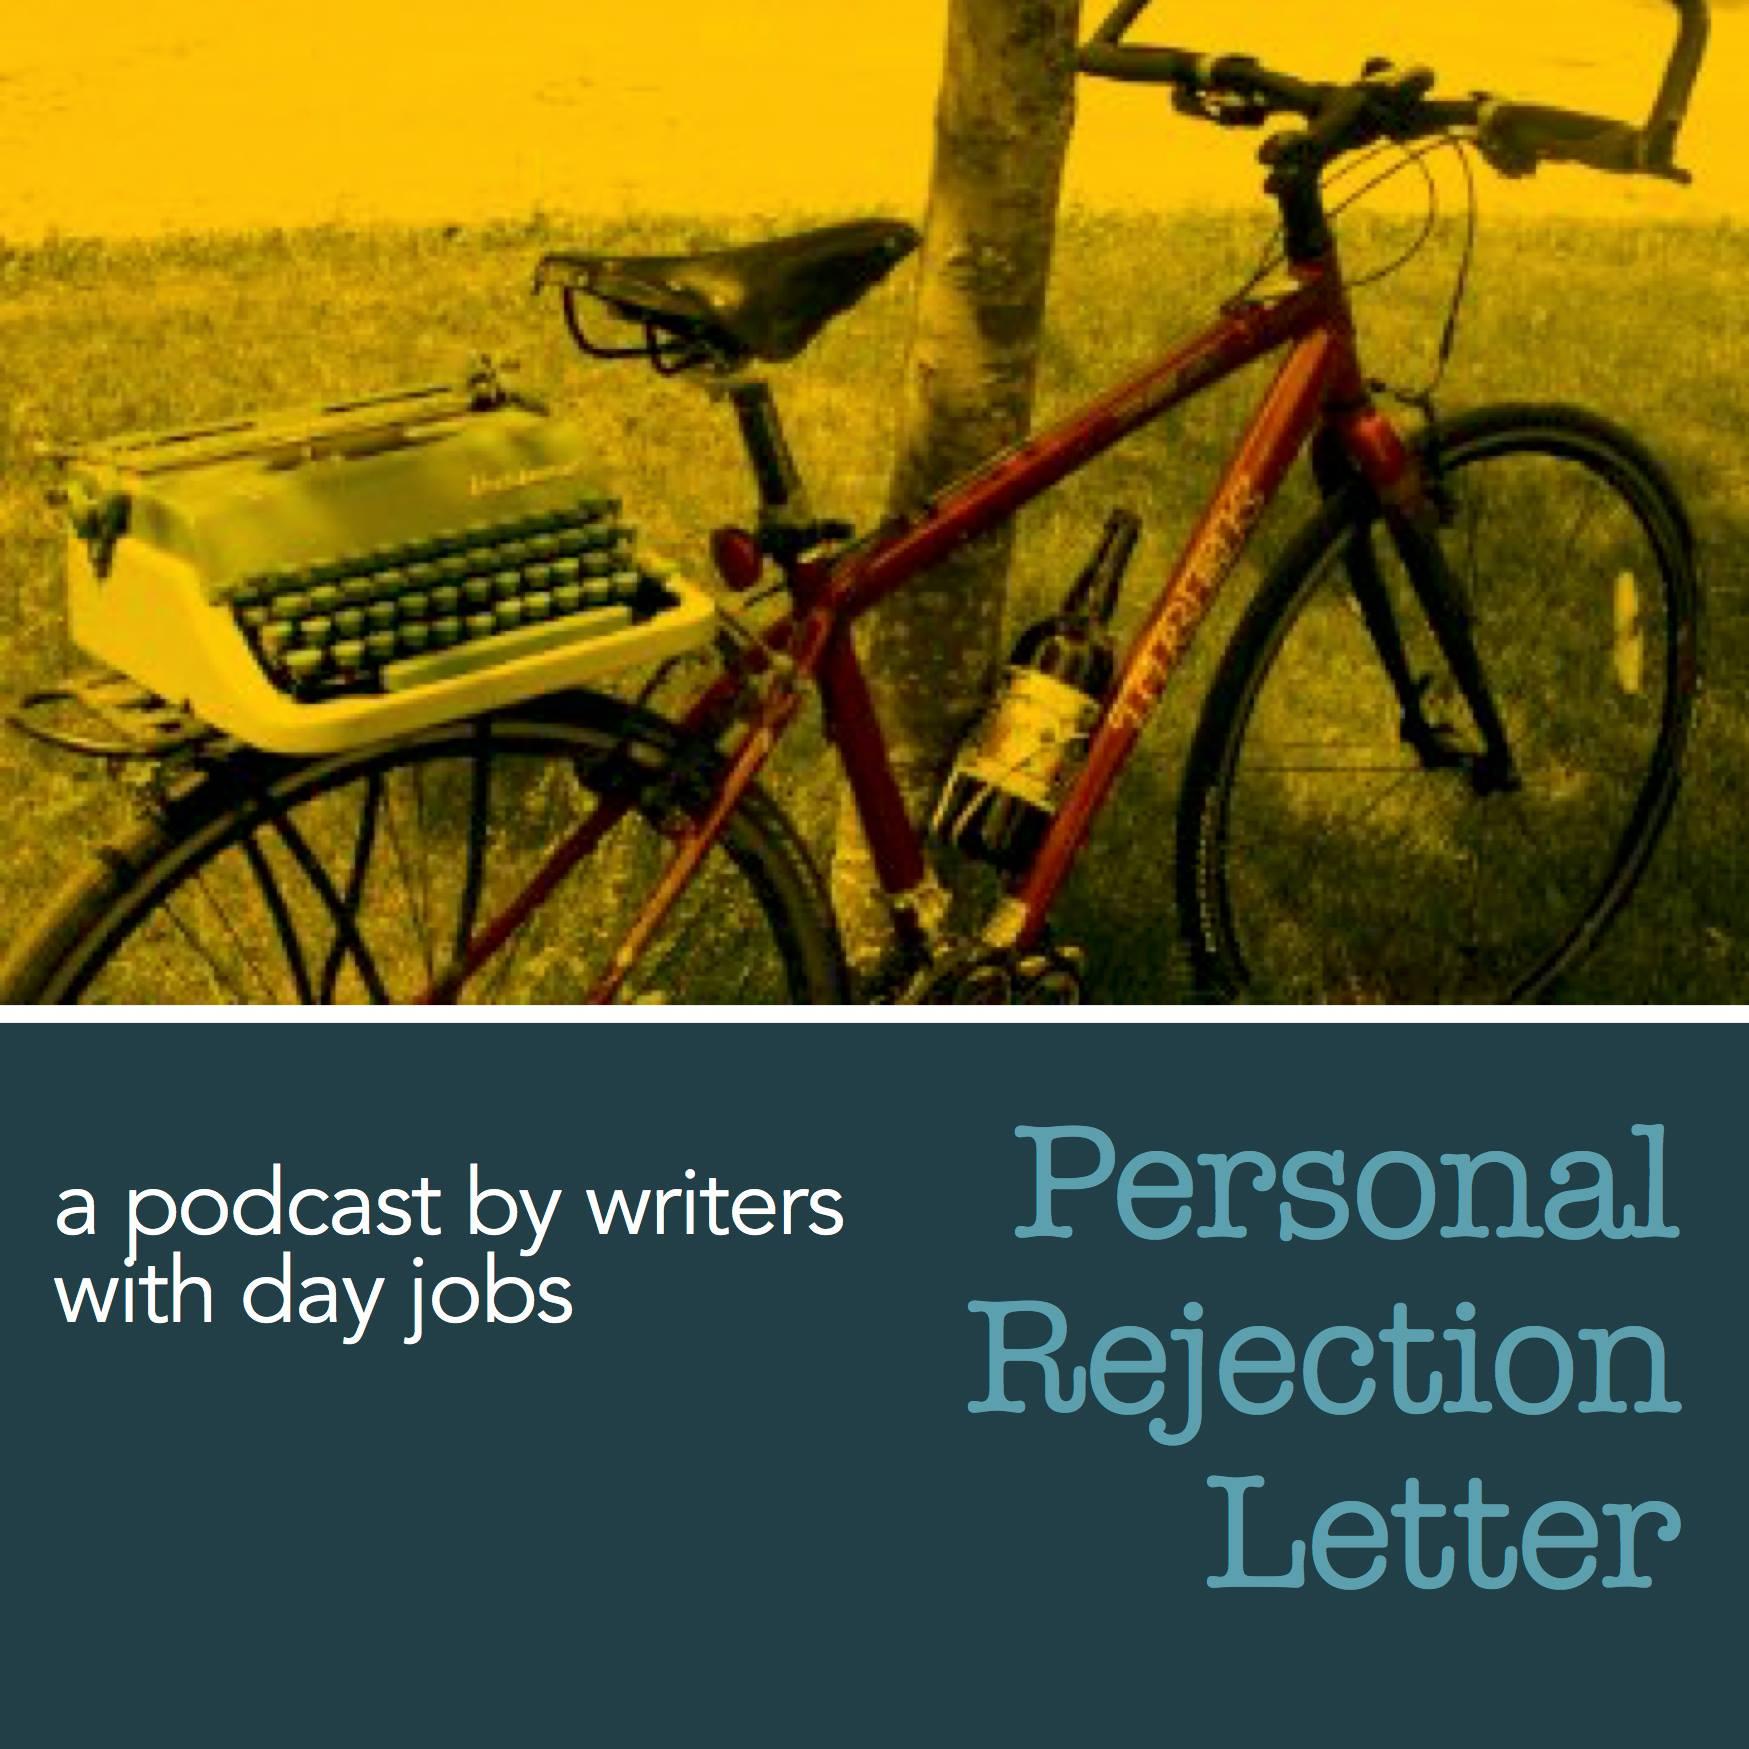 Personal Rejection Letter show art